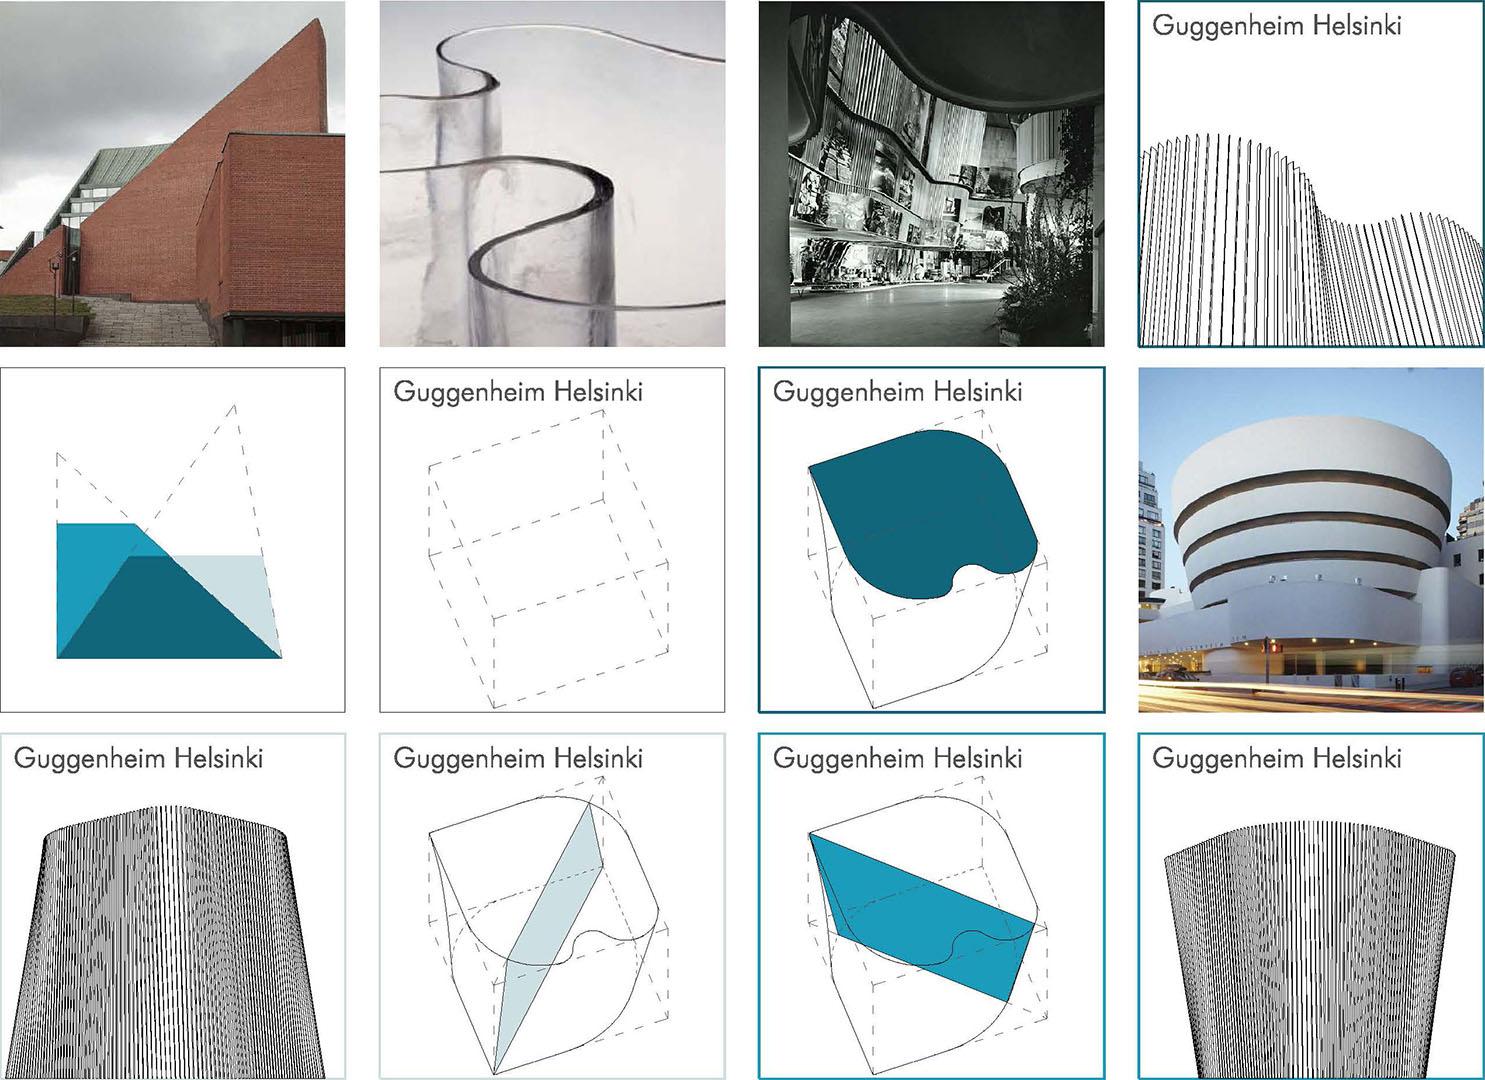 PLAYstudio_Guggenheim-Helsinki_Diagrama (2)